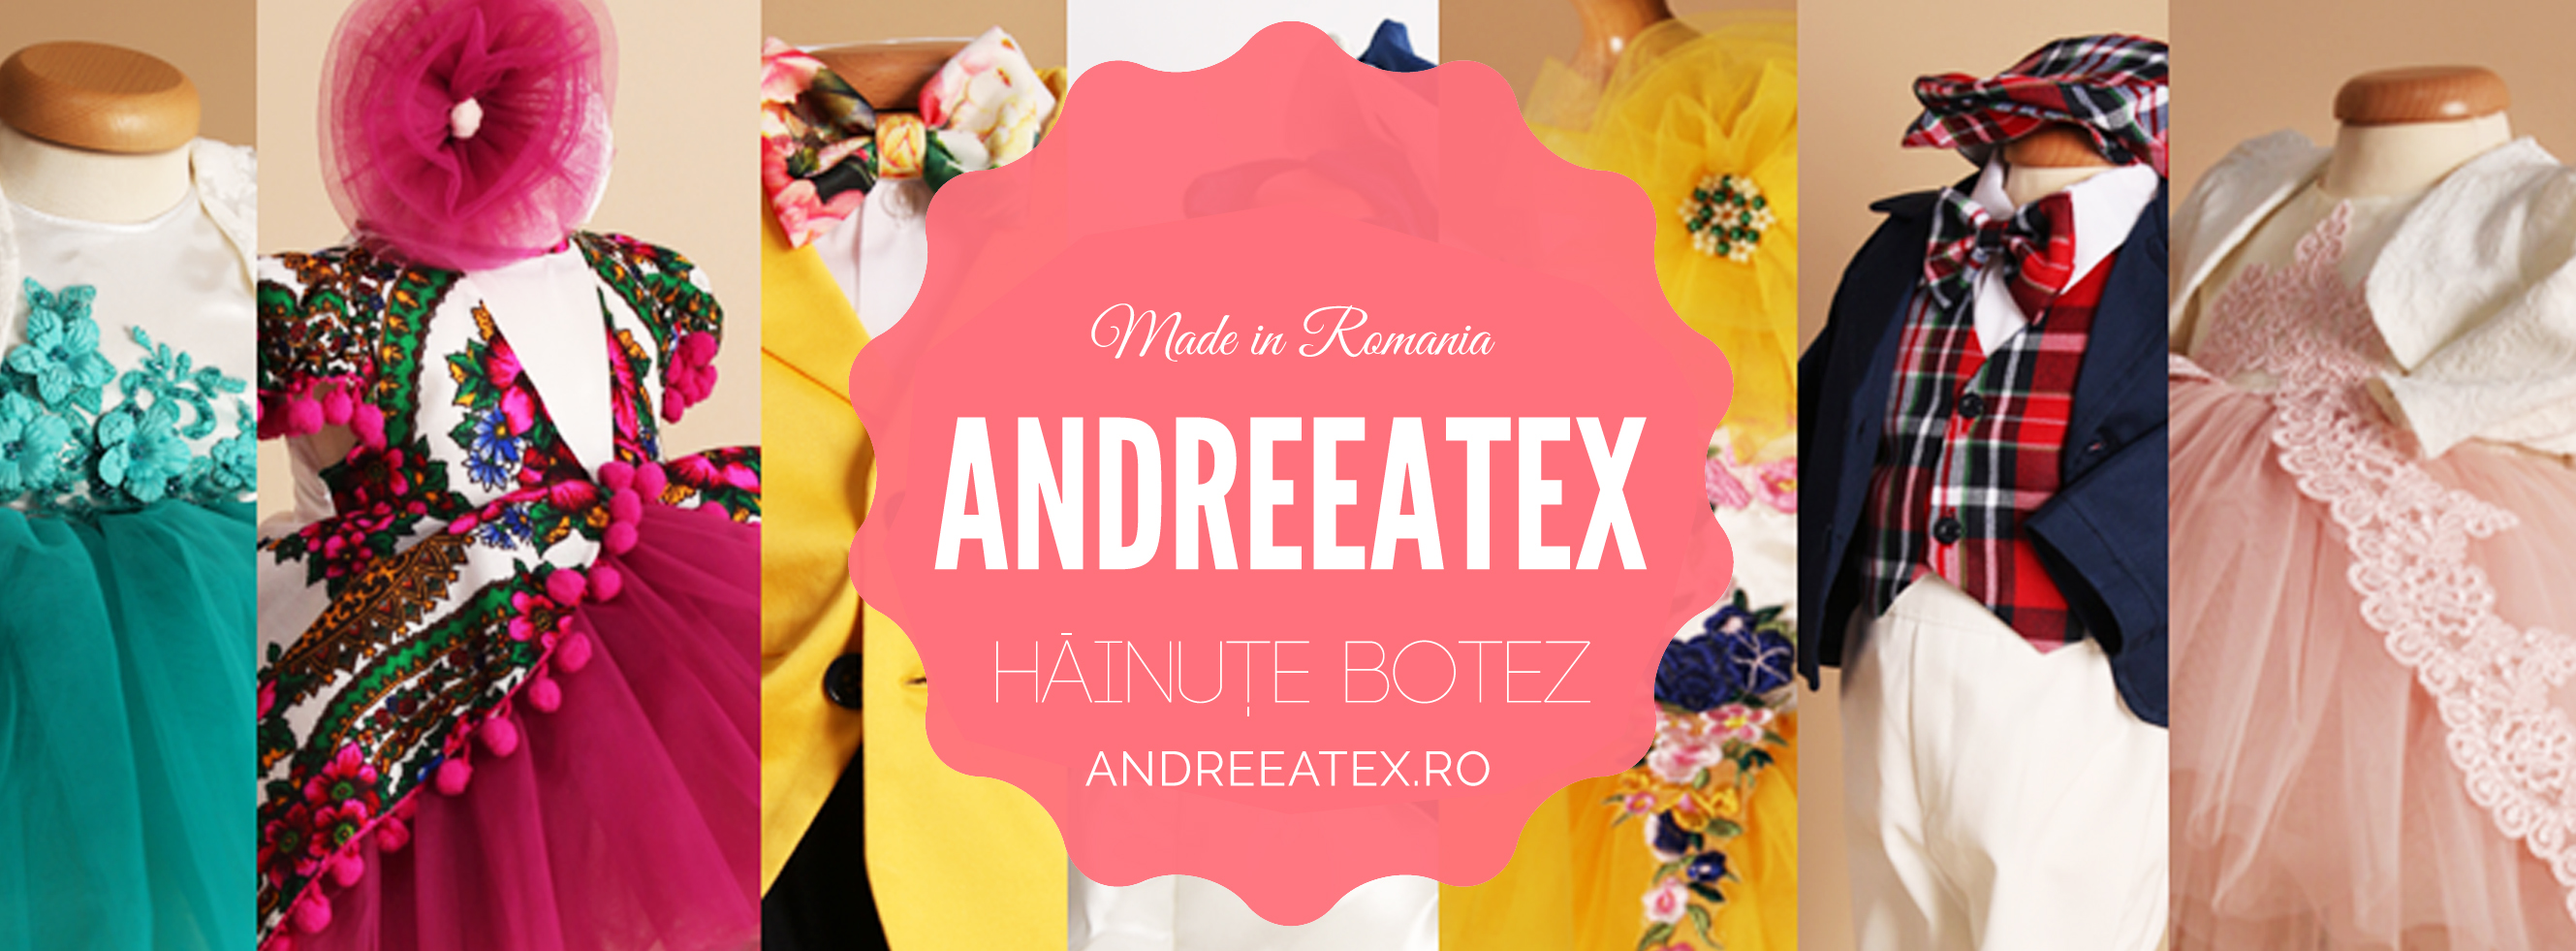 Andreeatex Hăinuțe Botez Produs în România